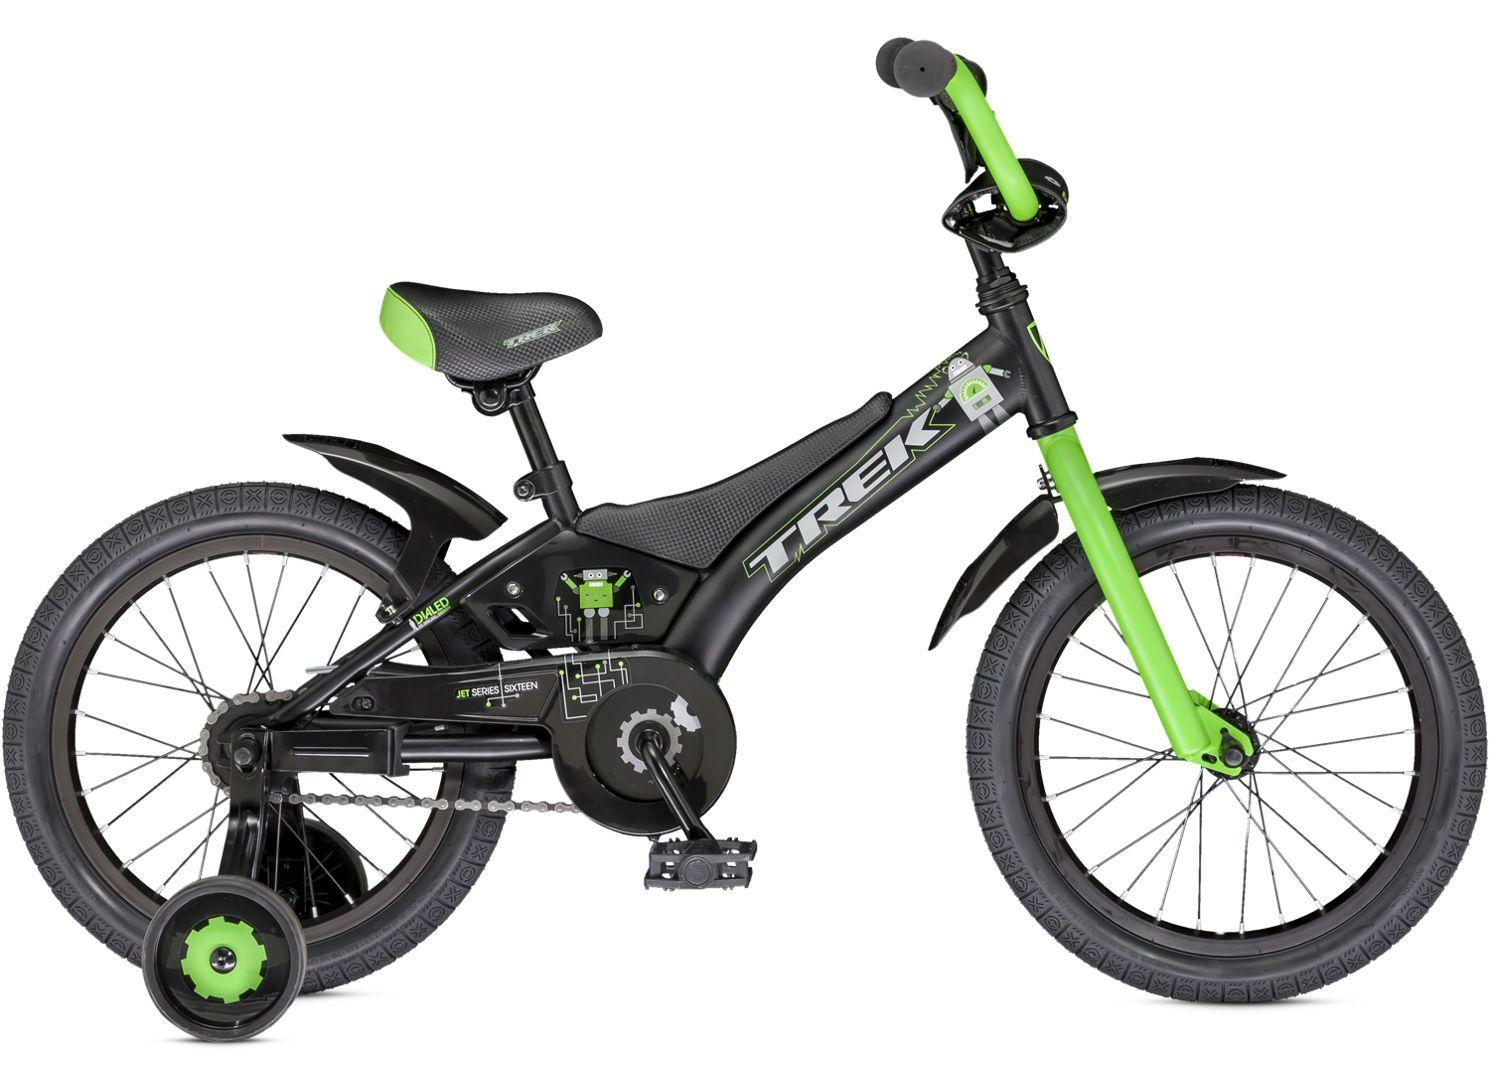 Joaquin S New Two Wheeler Jet 16 Kids Collection Trek Bicycle Trek Bicycle Trek Bikes City Bike